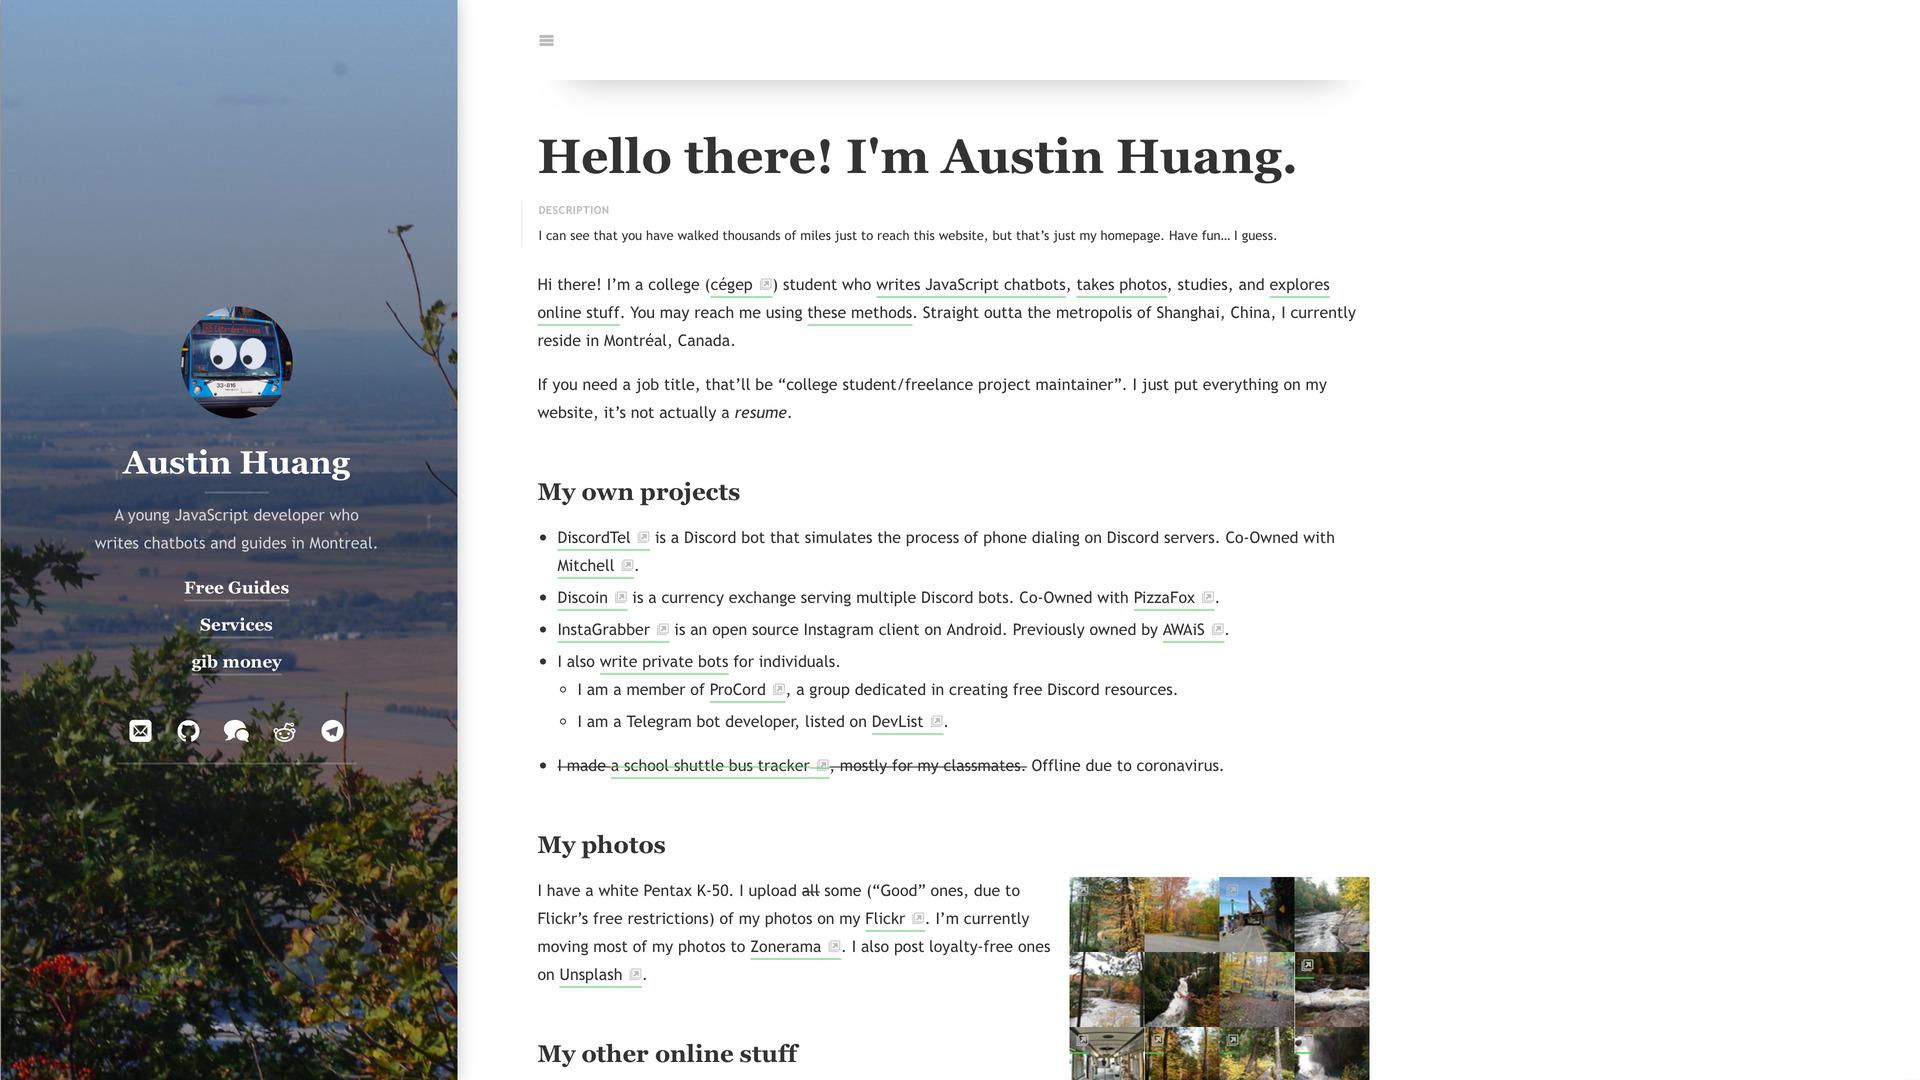 Austin Huang